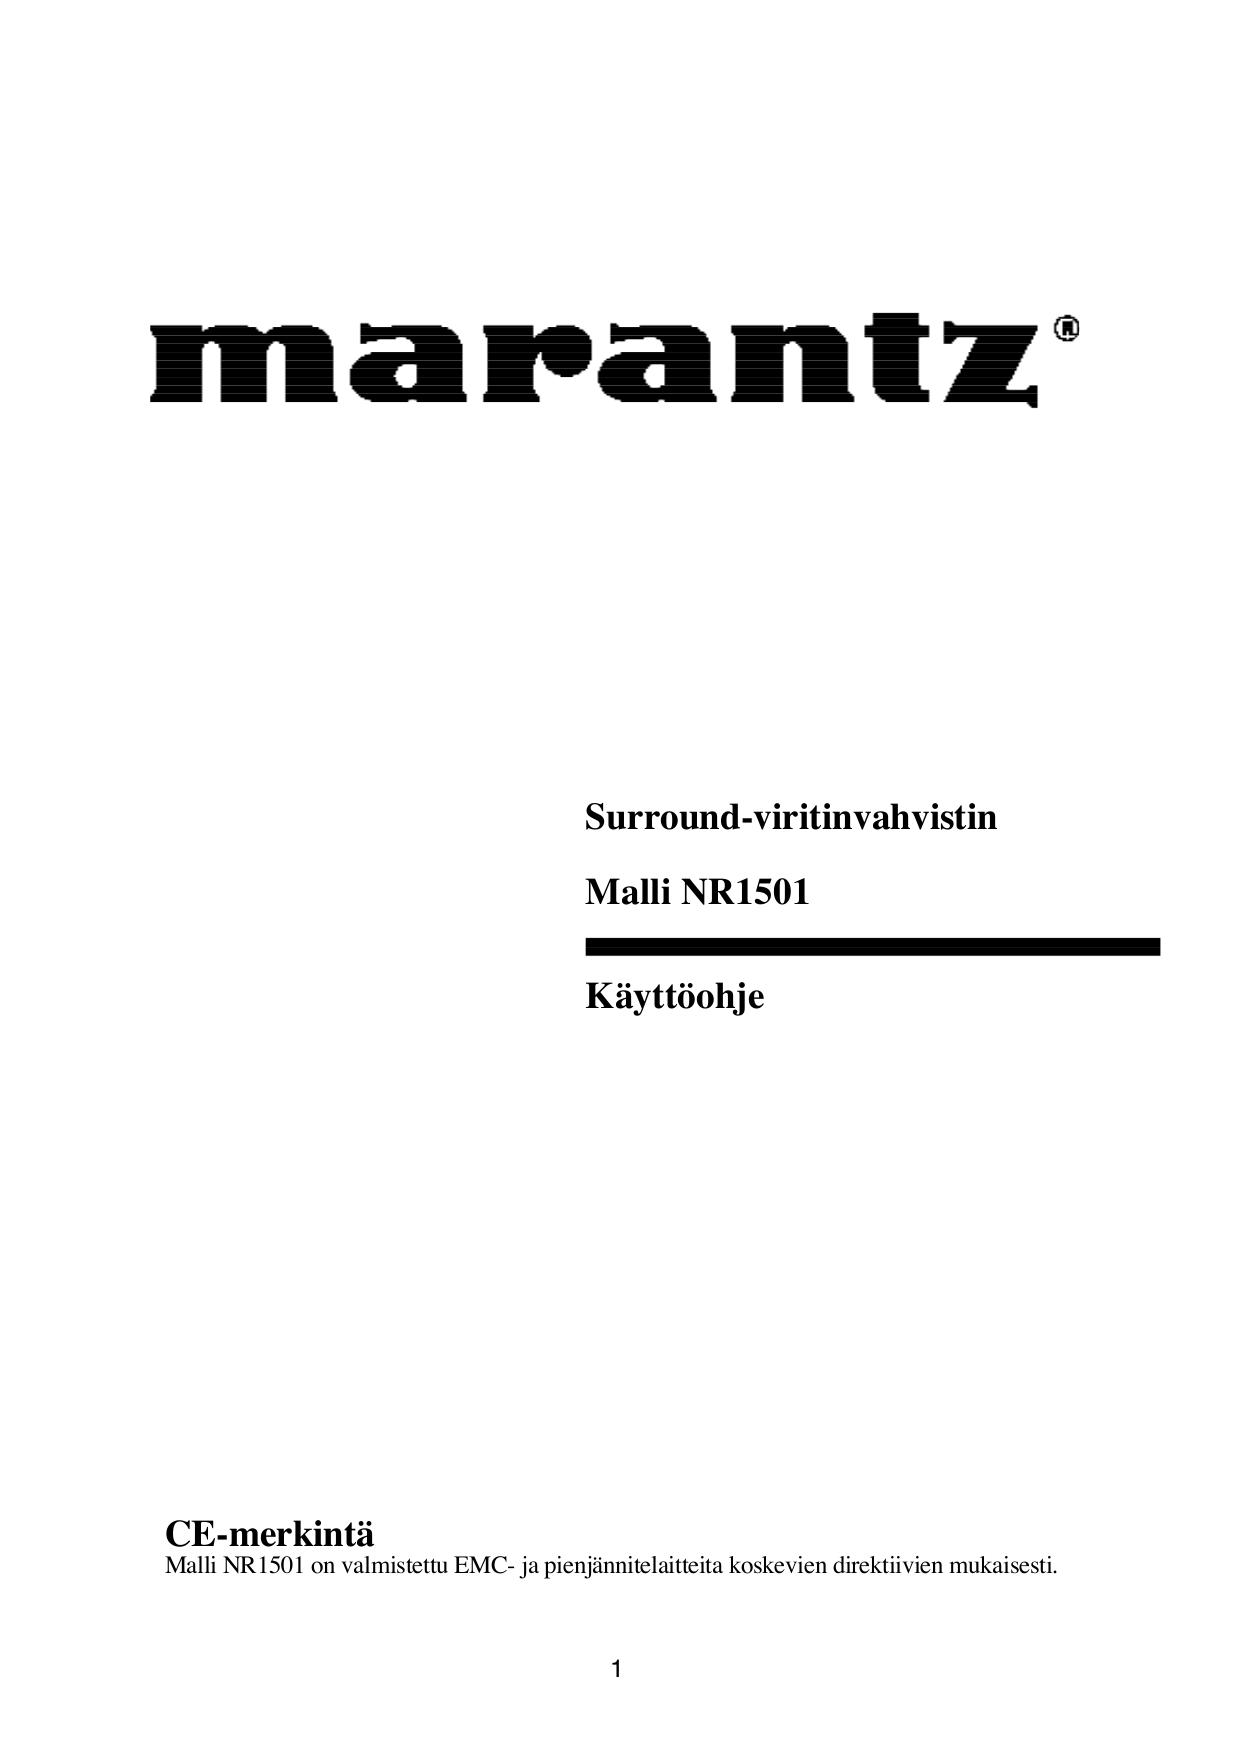 Download free pdf for Marantz NR1501 Receiver manual